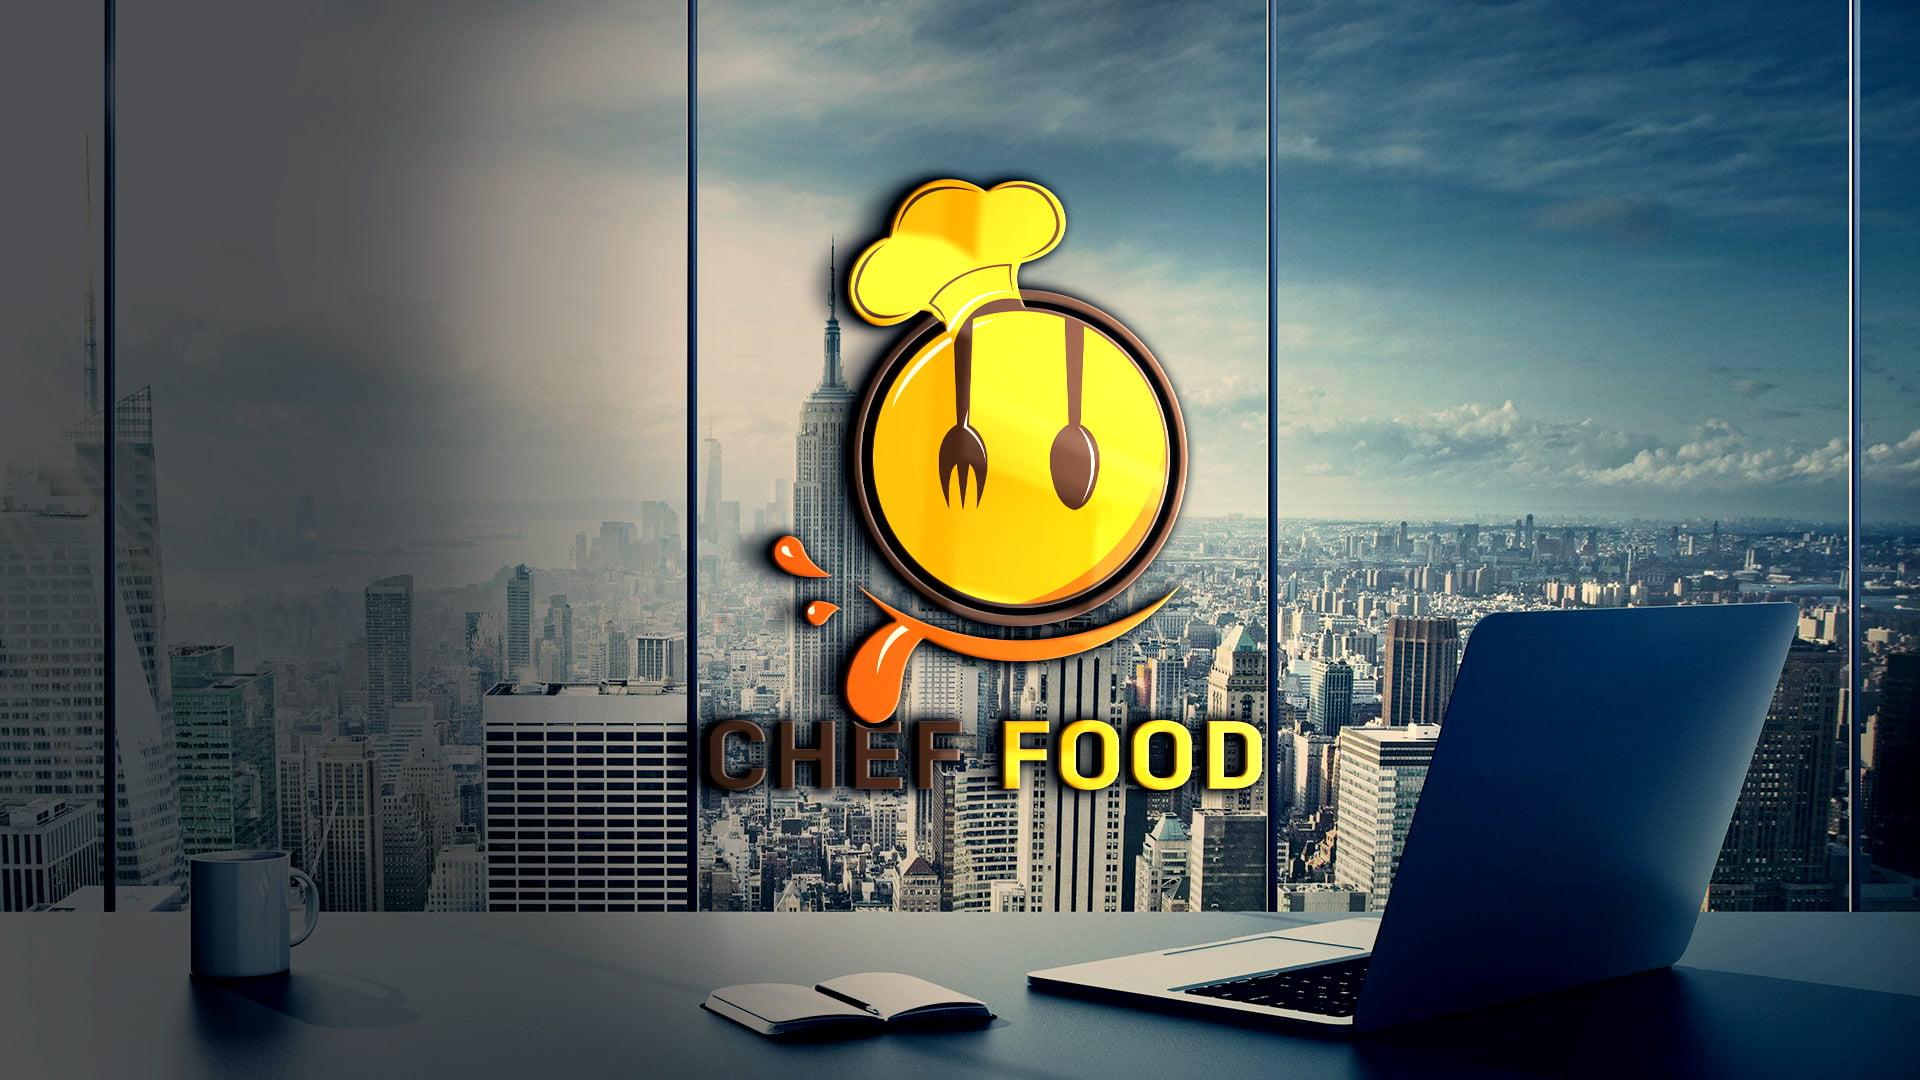 Free Editable Photoshop Food Logo Design